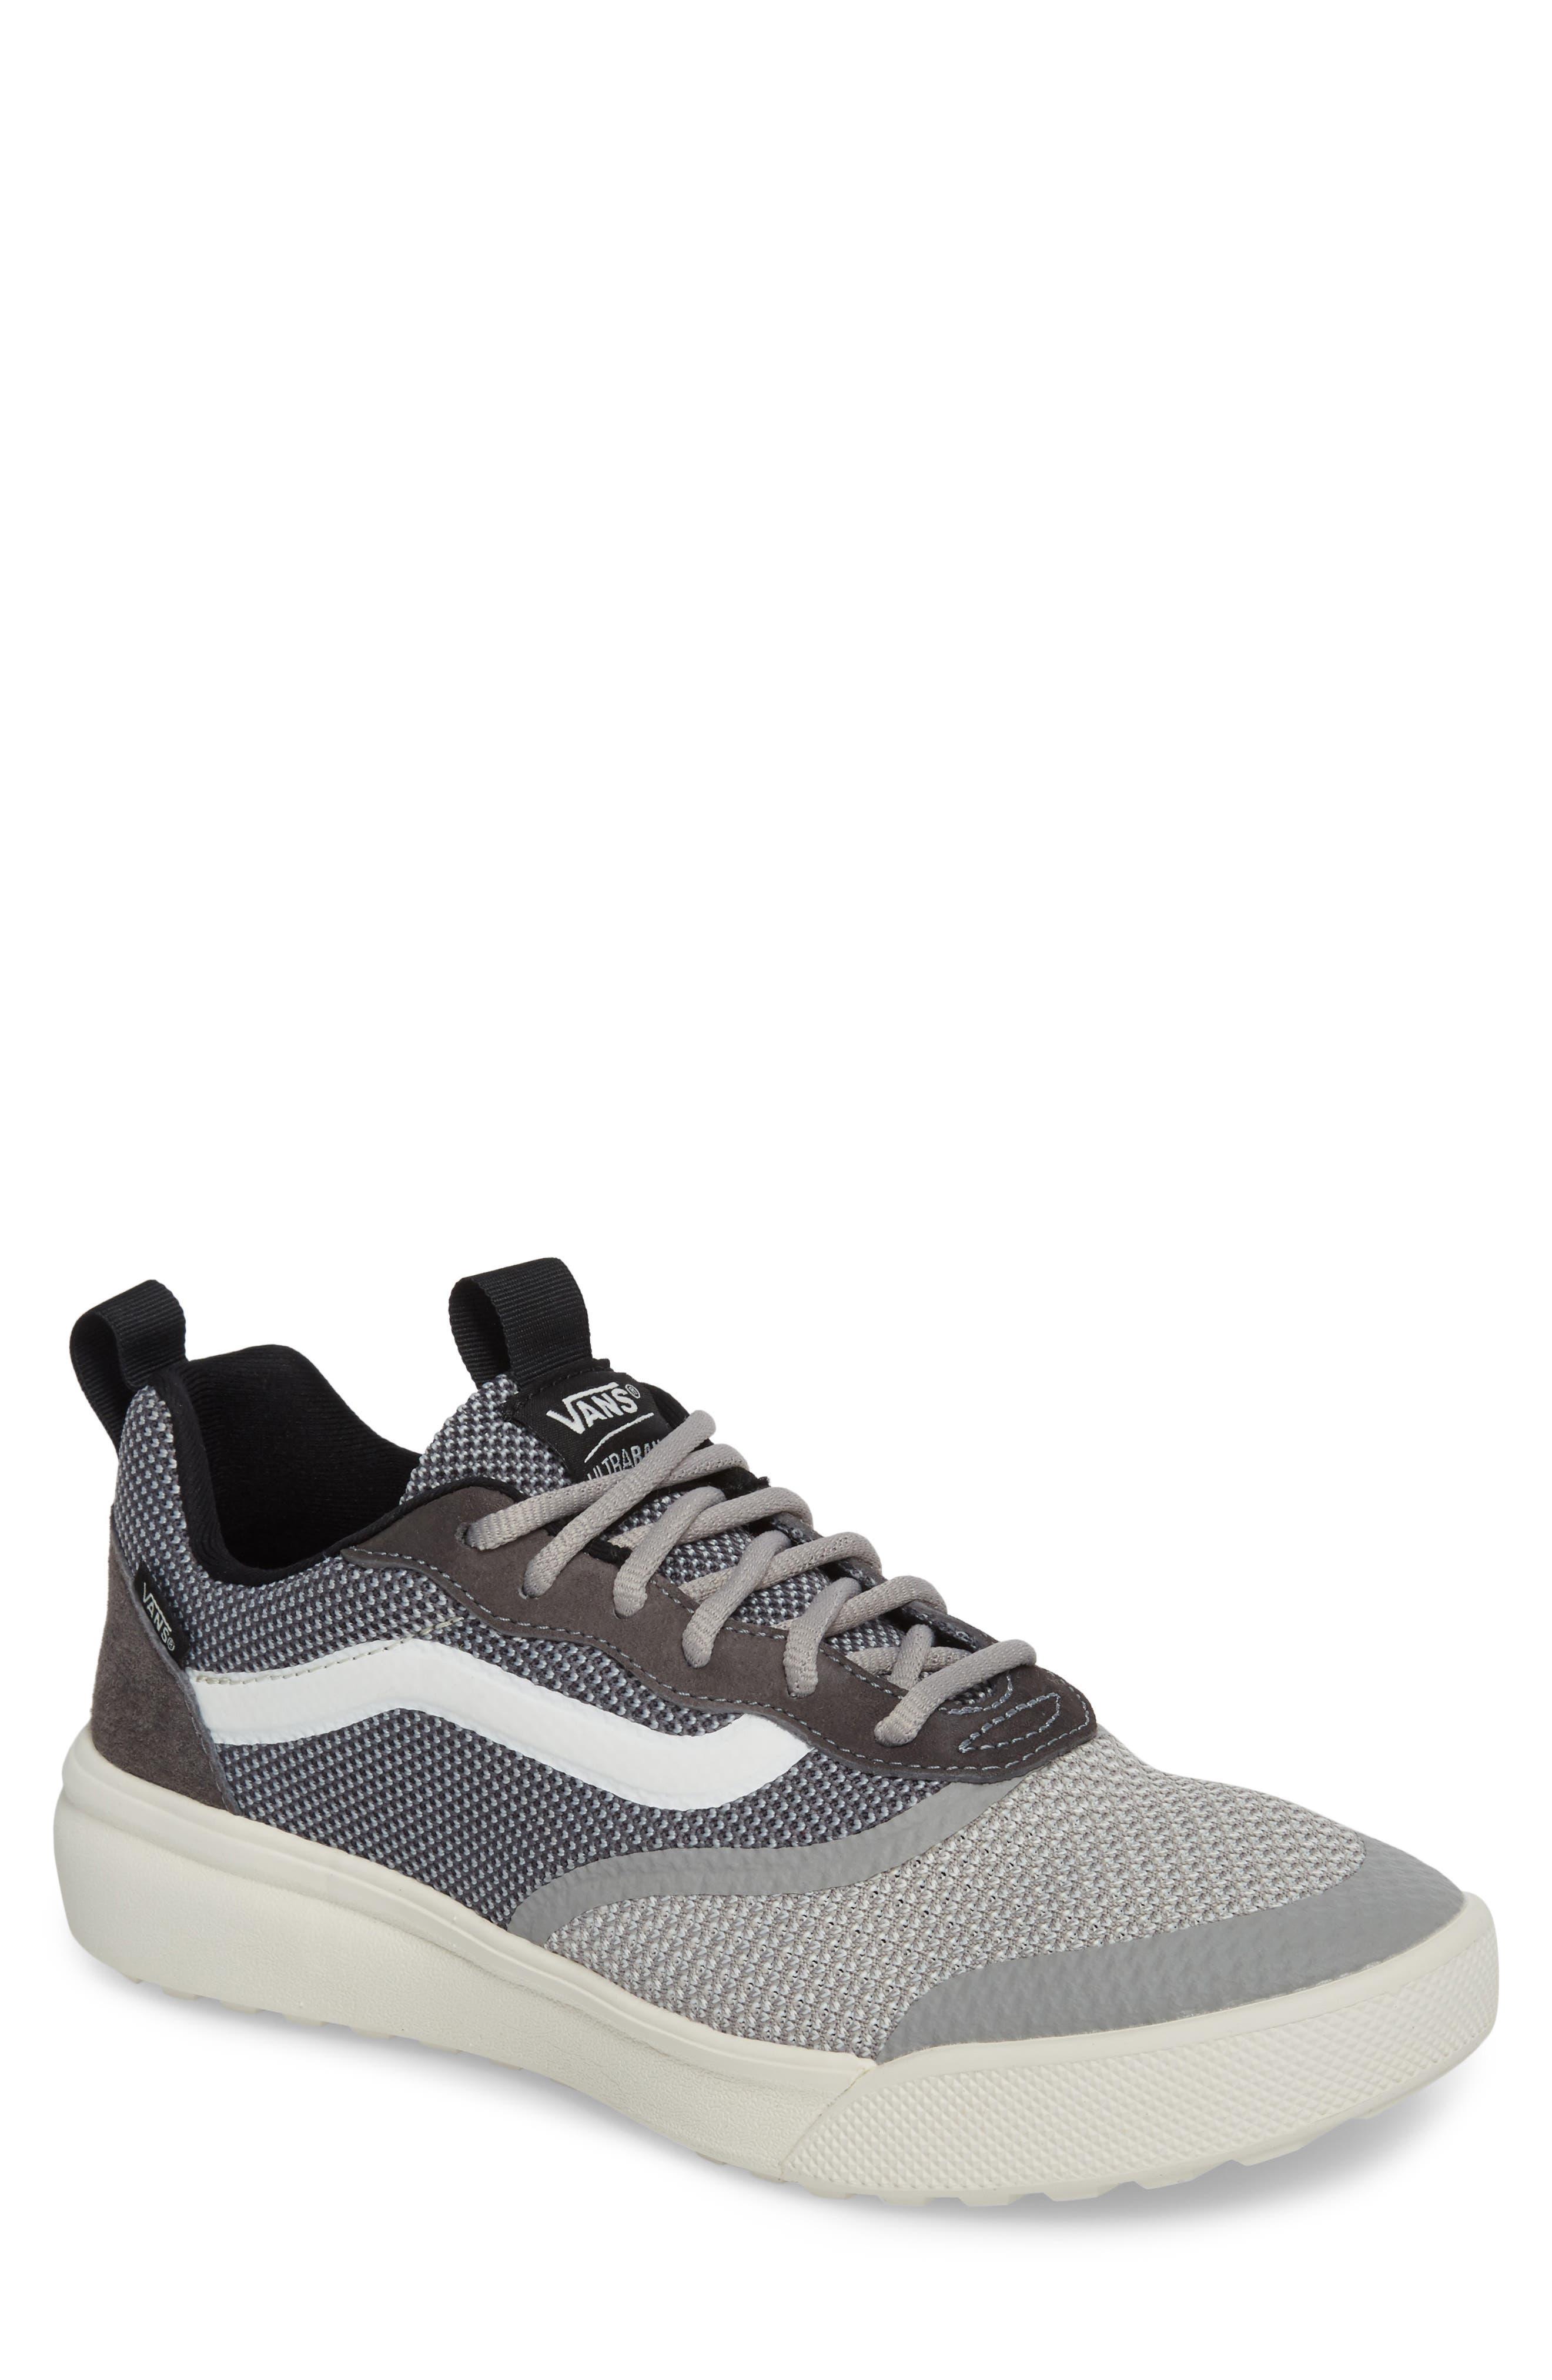 UltraRange DX Low Top Sneaker,                             Main thumbnail 1, color,